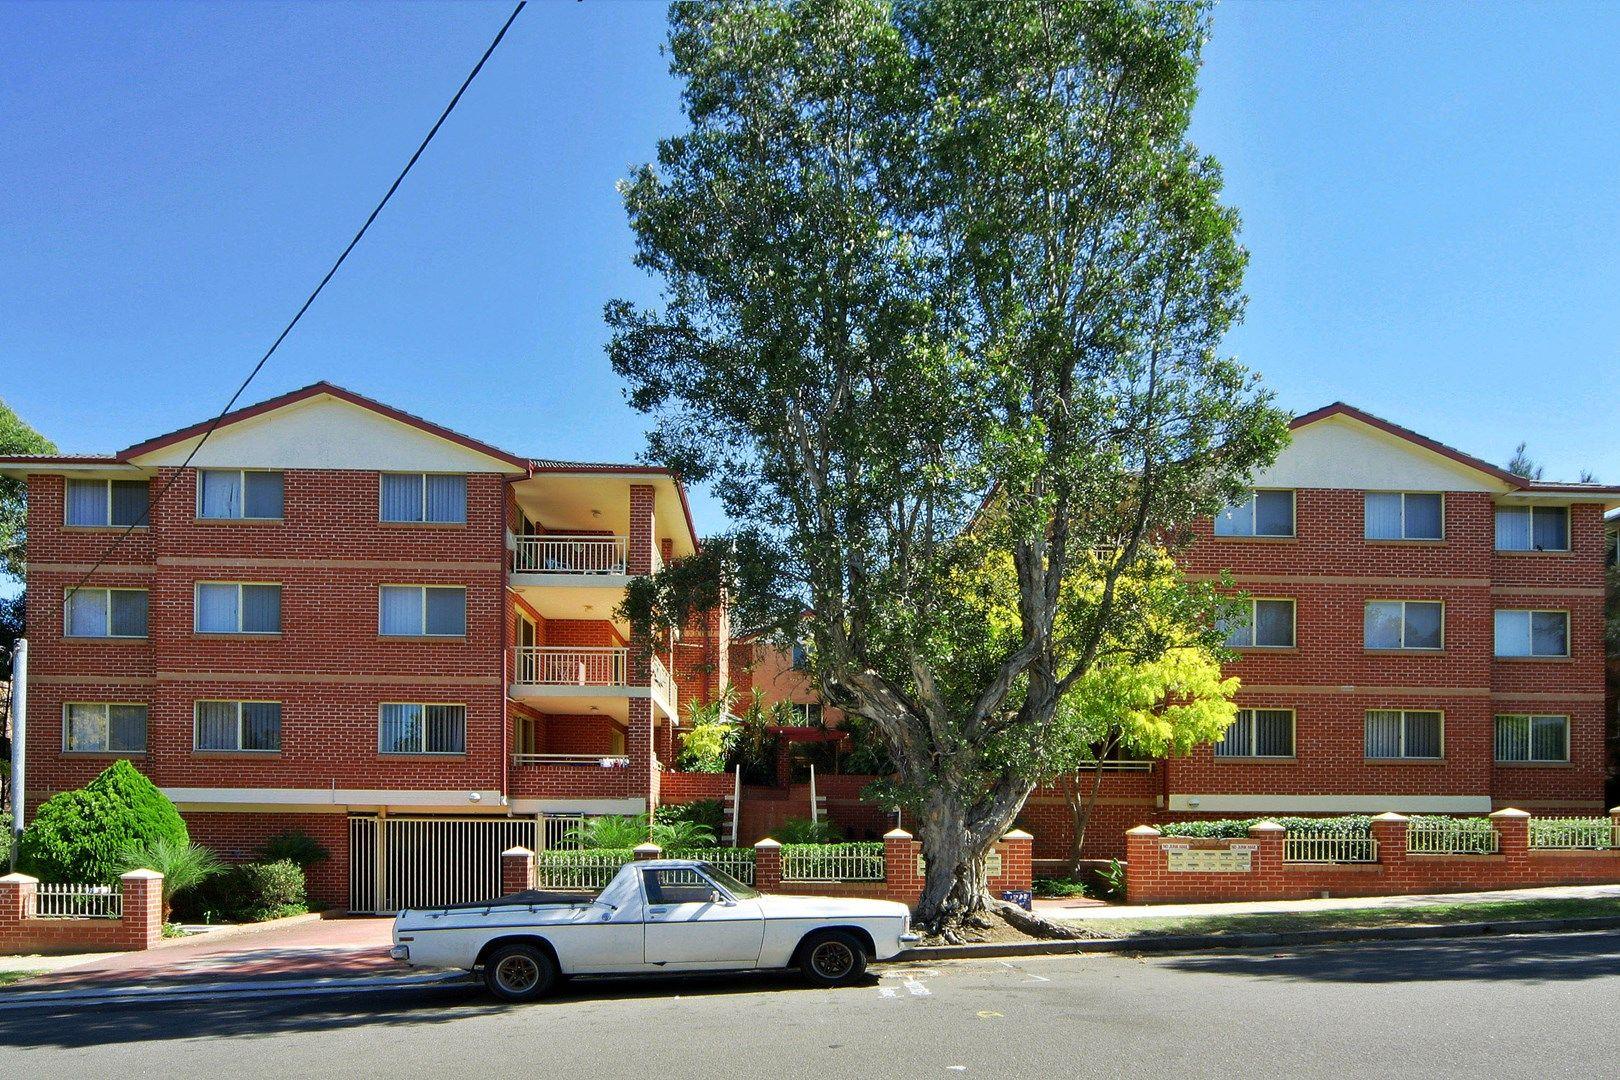 3/59-63 Buller Street, North Parramatta NSW 2151, Image 0